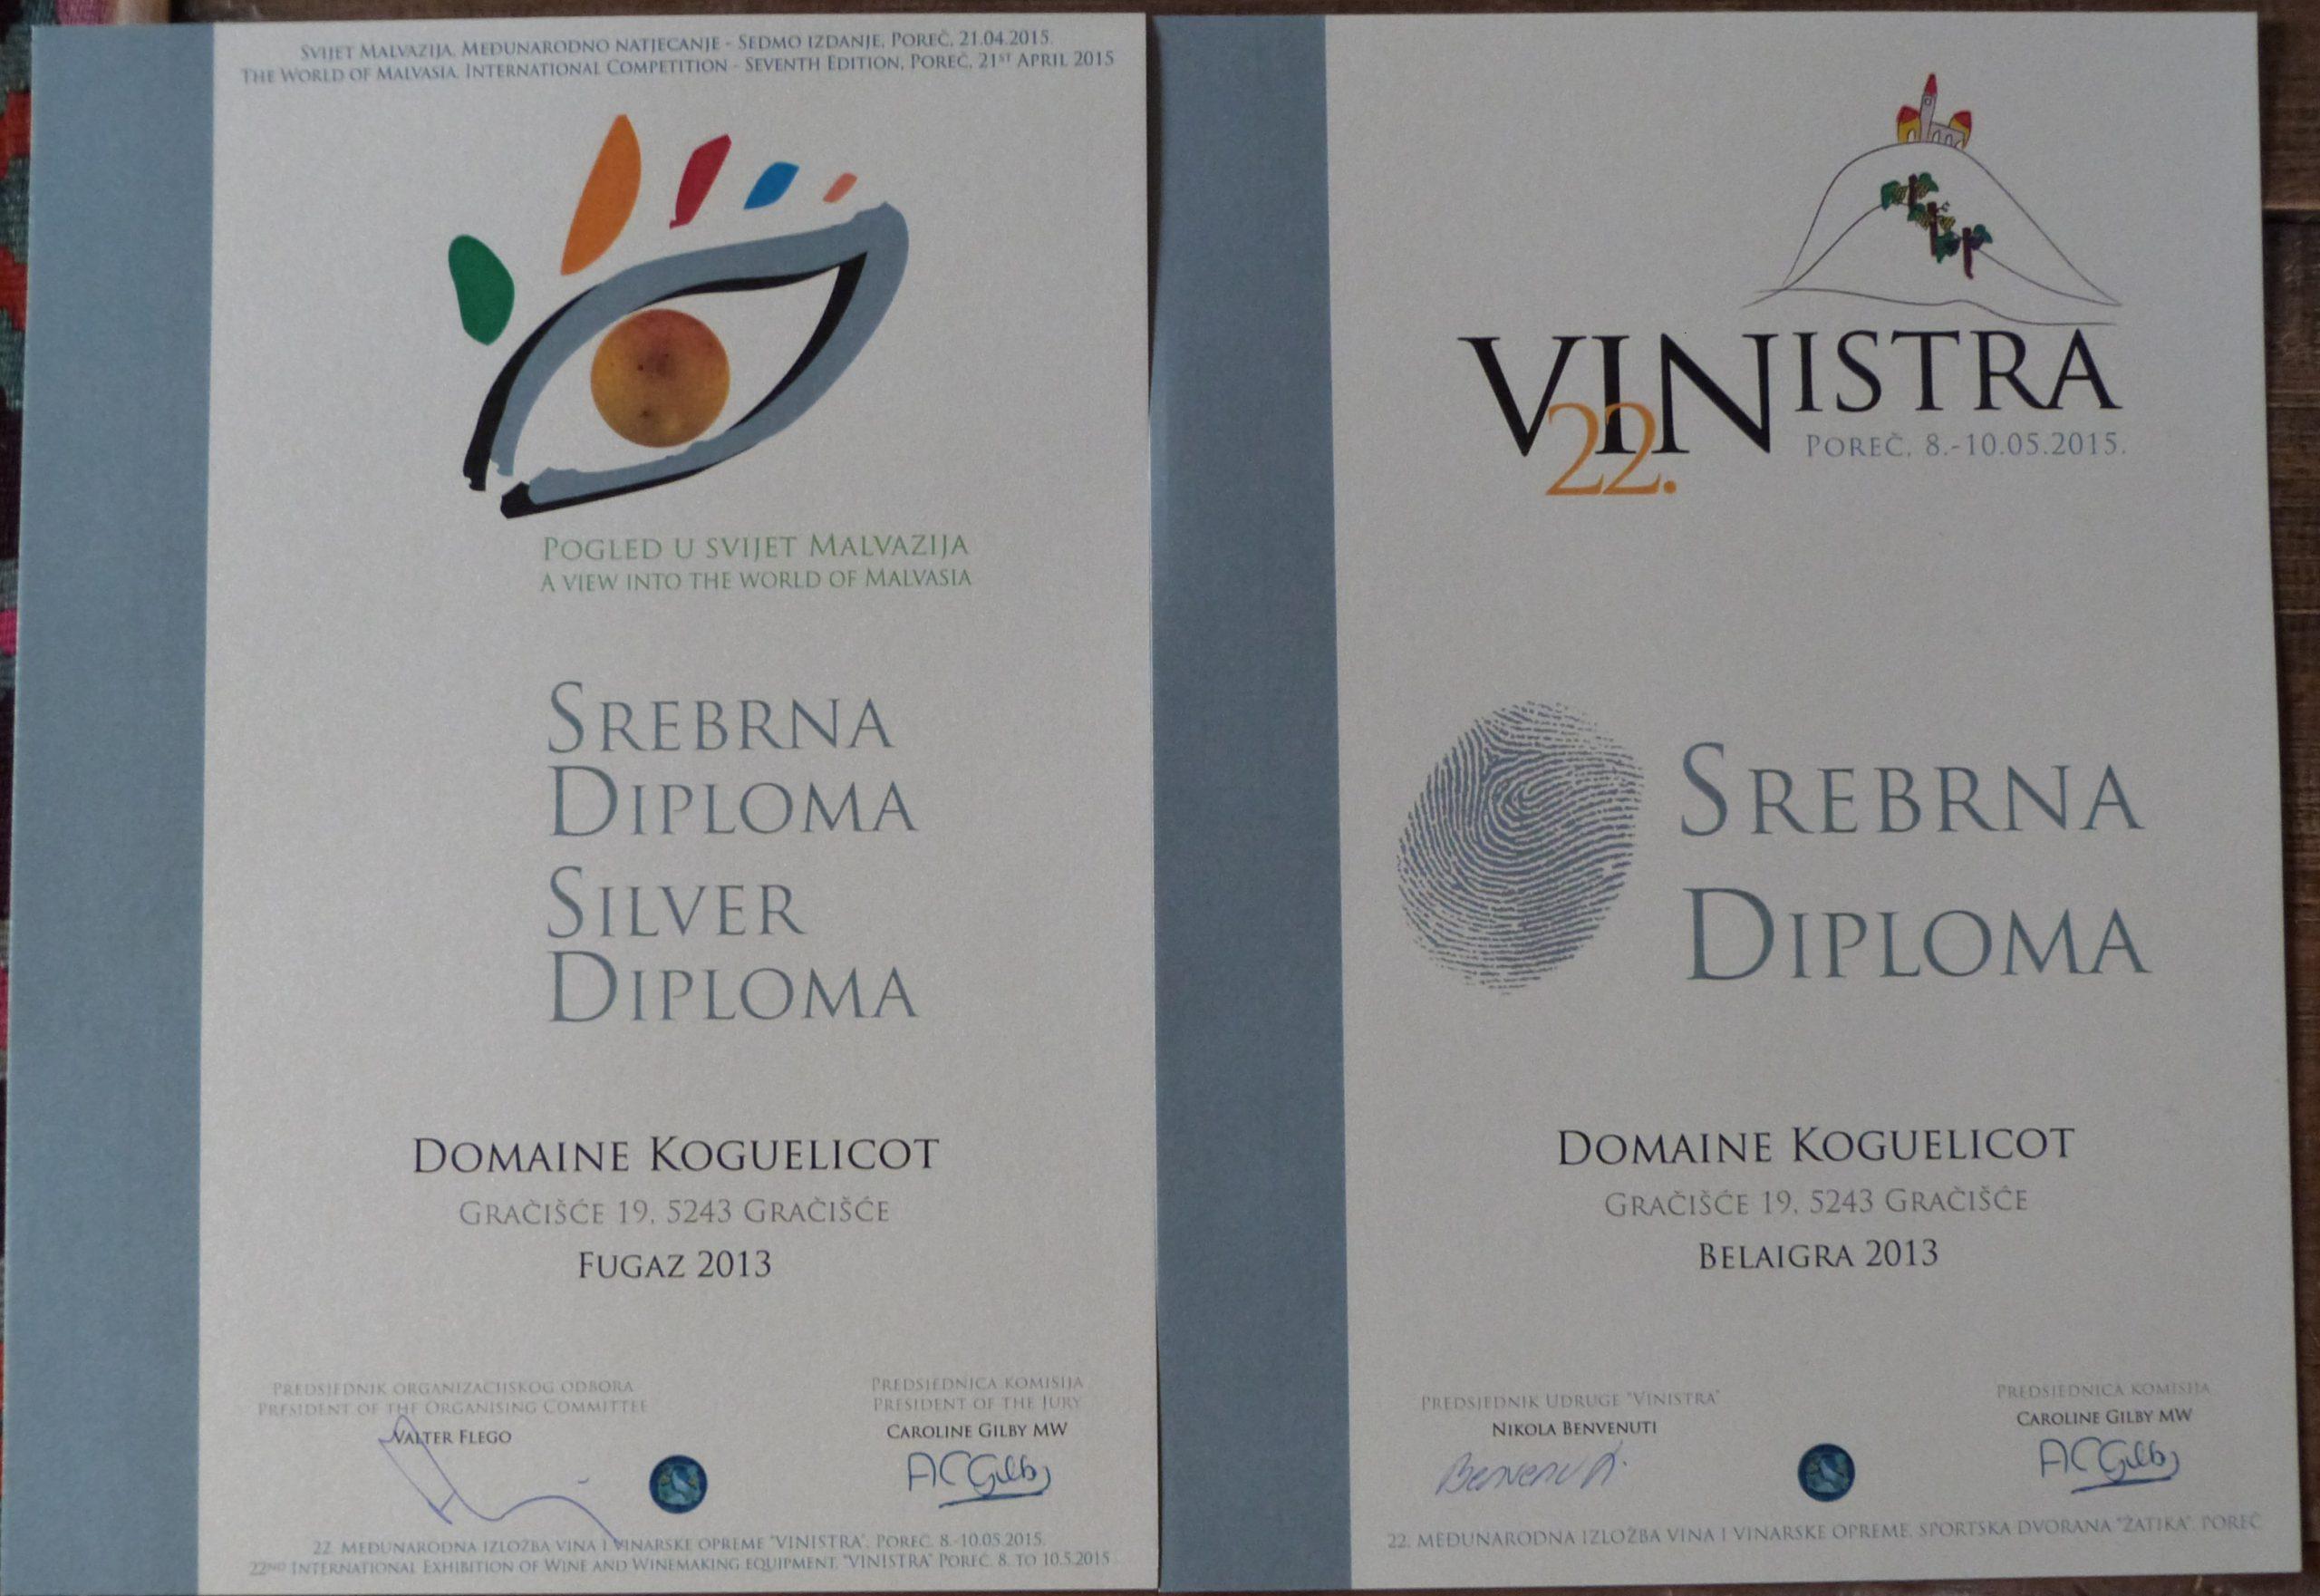 Vinistra 2015 Diplomas